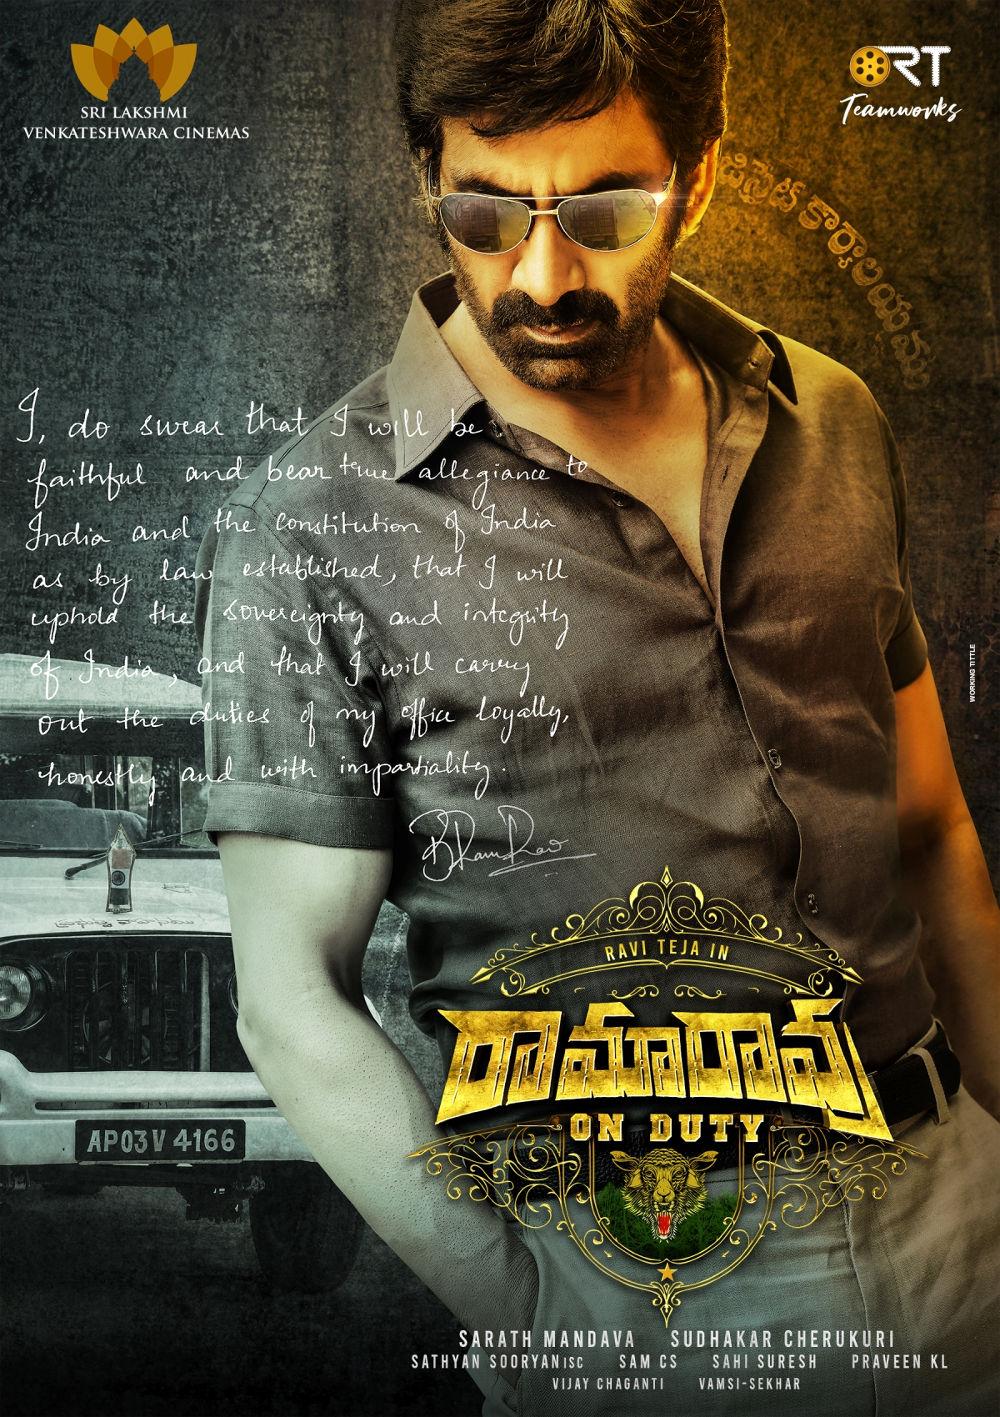 Actor Ravi Teja Ramarao On Duty First Look HD Poster